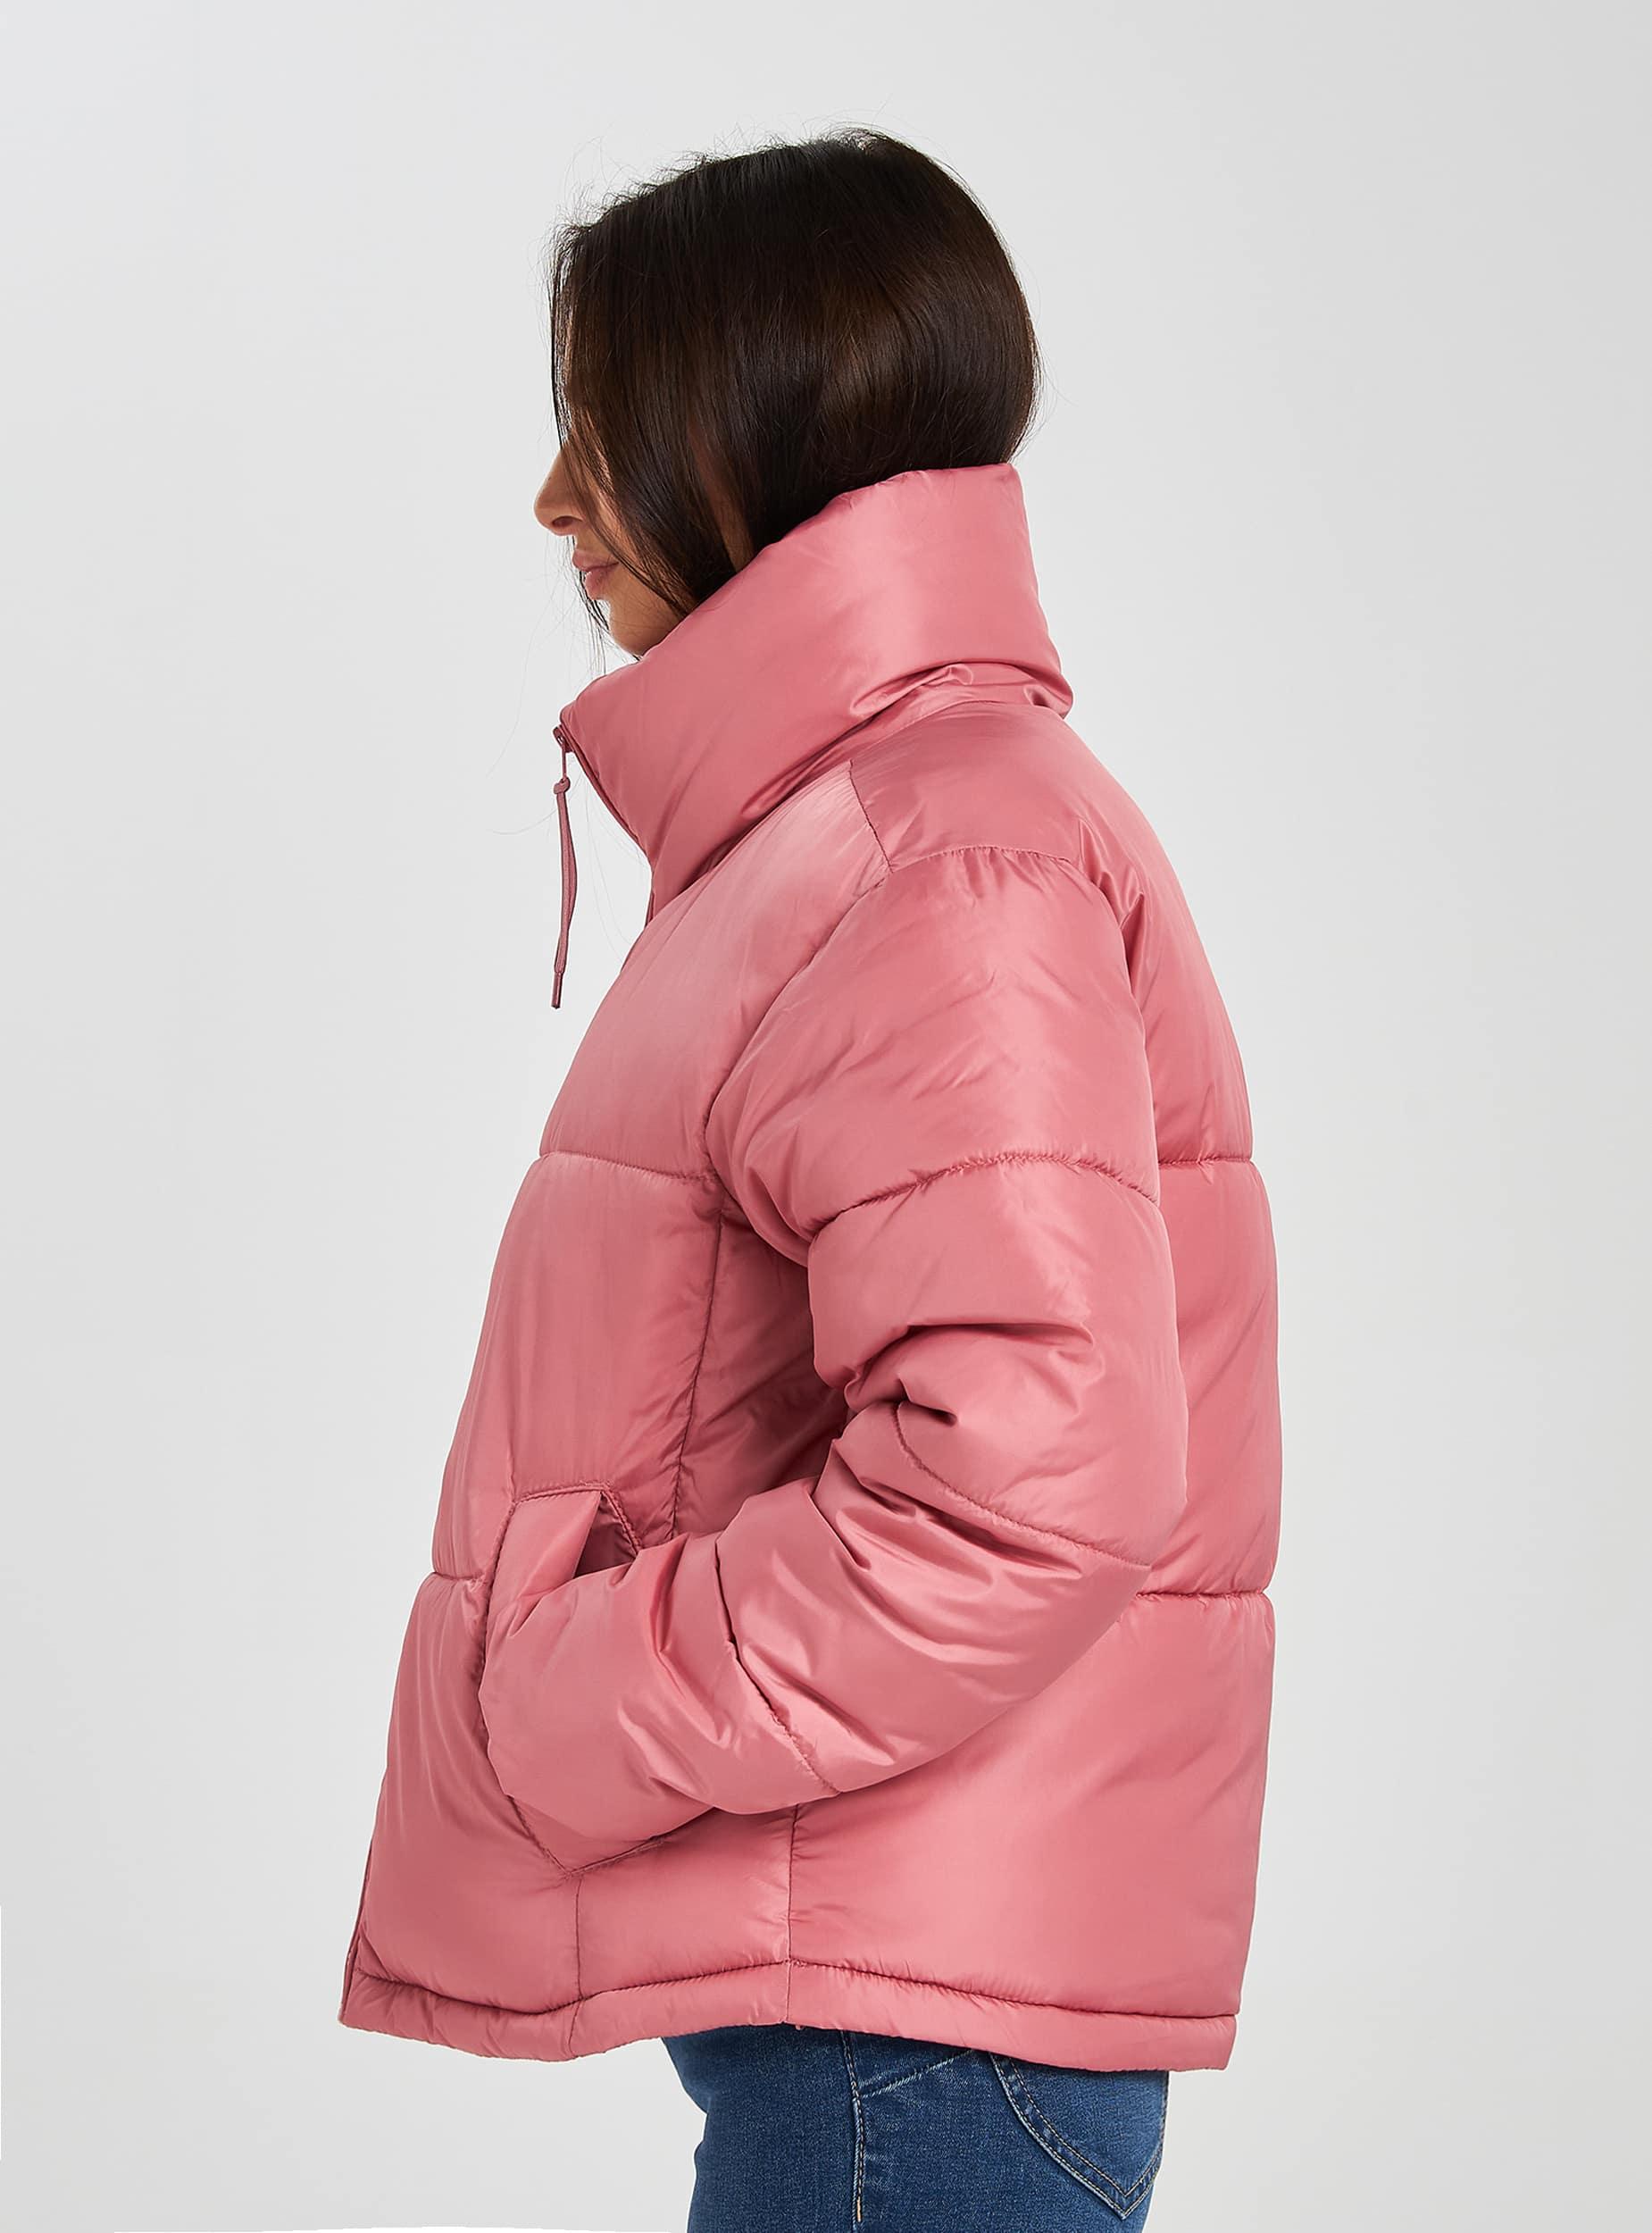 Rosa Puff-Daunenjacke mit hohem Kragen | Terranova